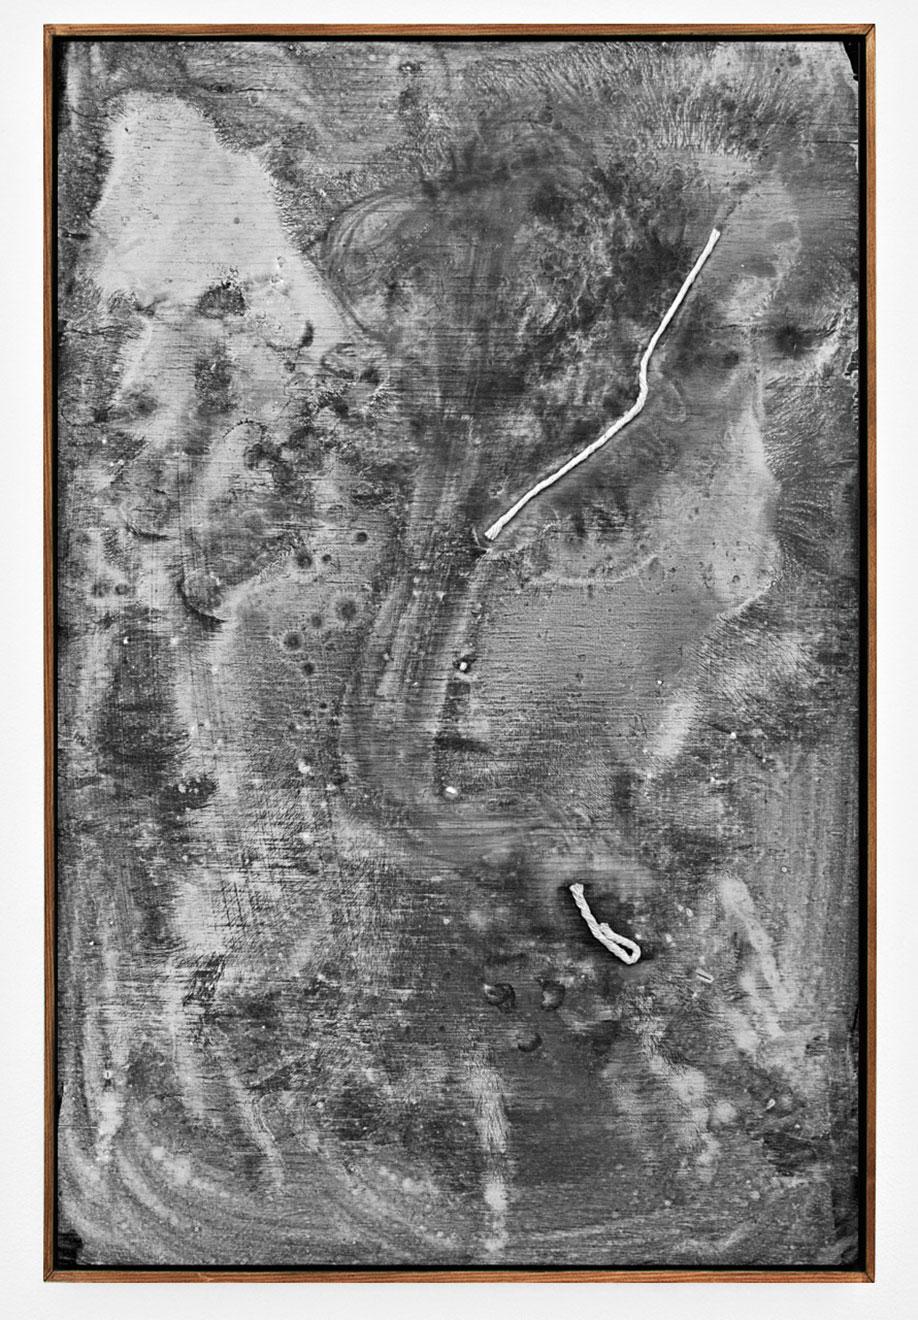 <b>Title:&nbsp;</b>Entangled Soups Cessation<br /><b>Year:&nbsp;</b>2012<br /><b>Medium:&nbsp;</b>Chalk and blackboard paint on plywood<br /><b>Size:&nbsp;</b>59 x 39 cm